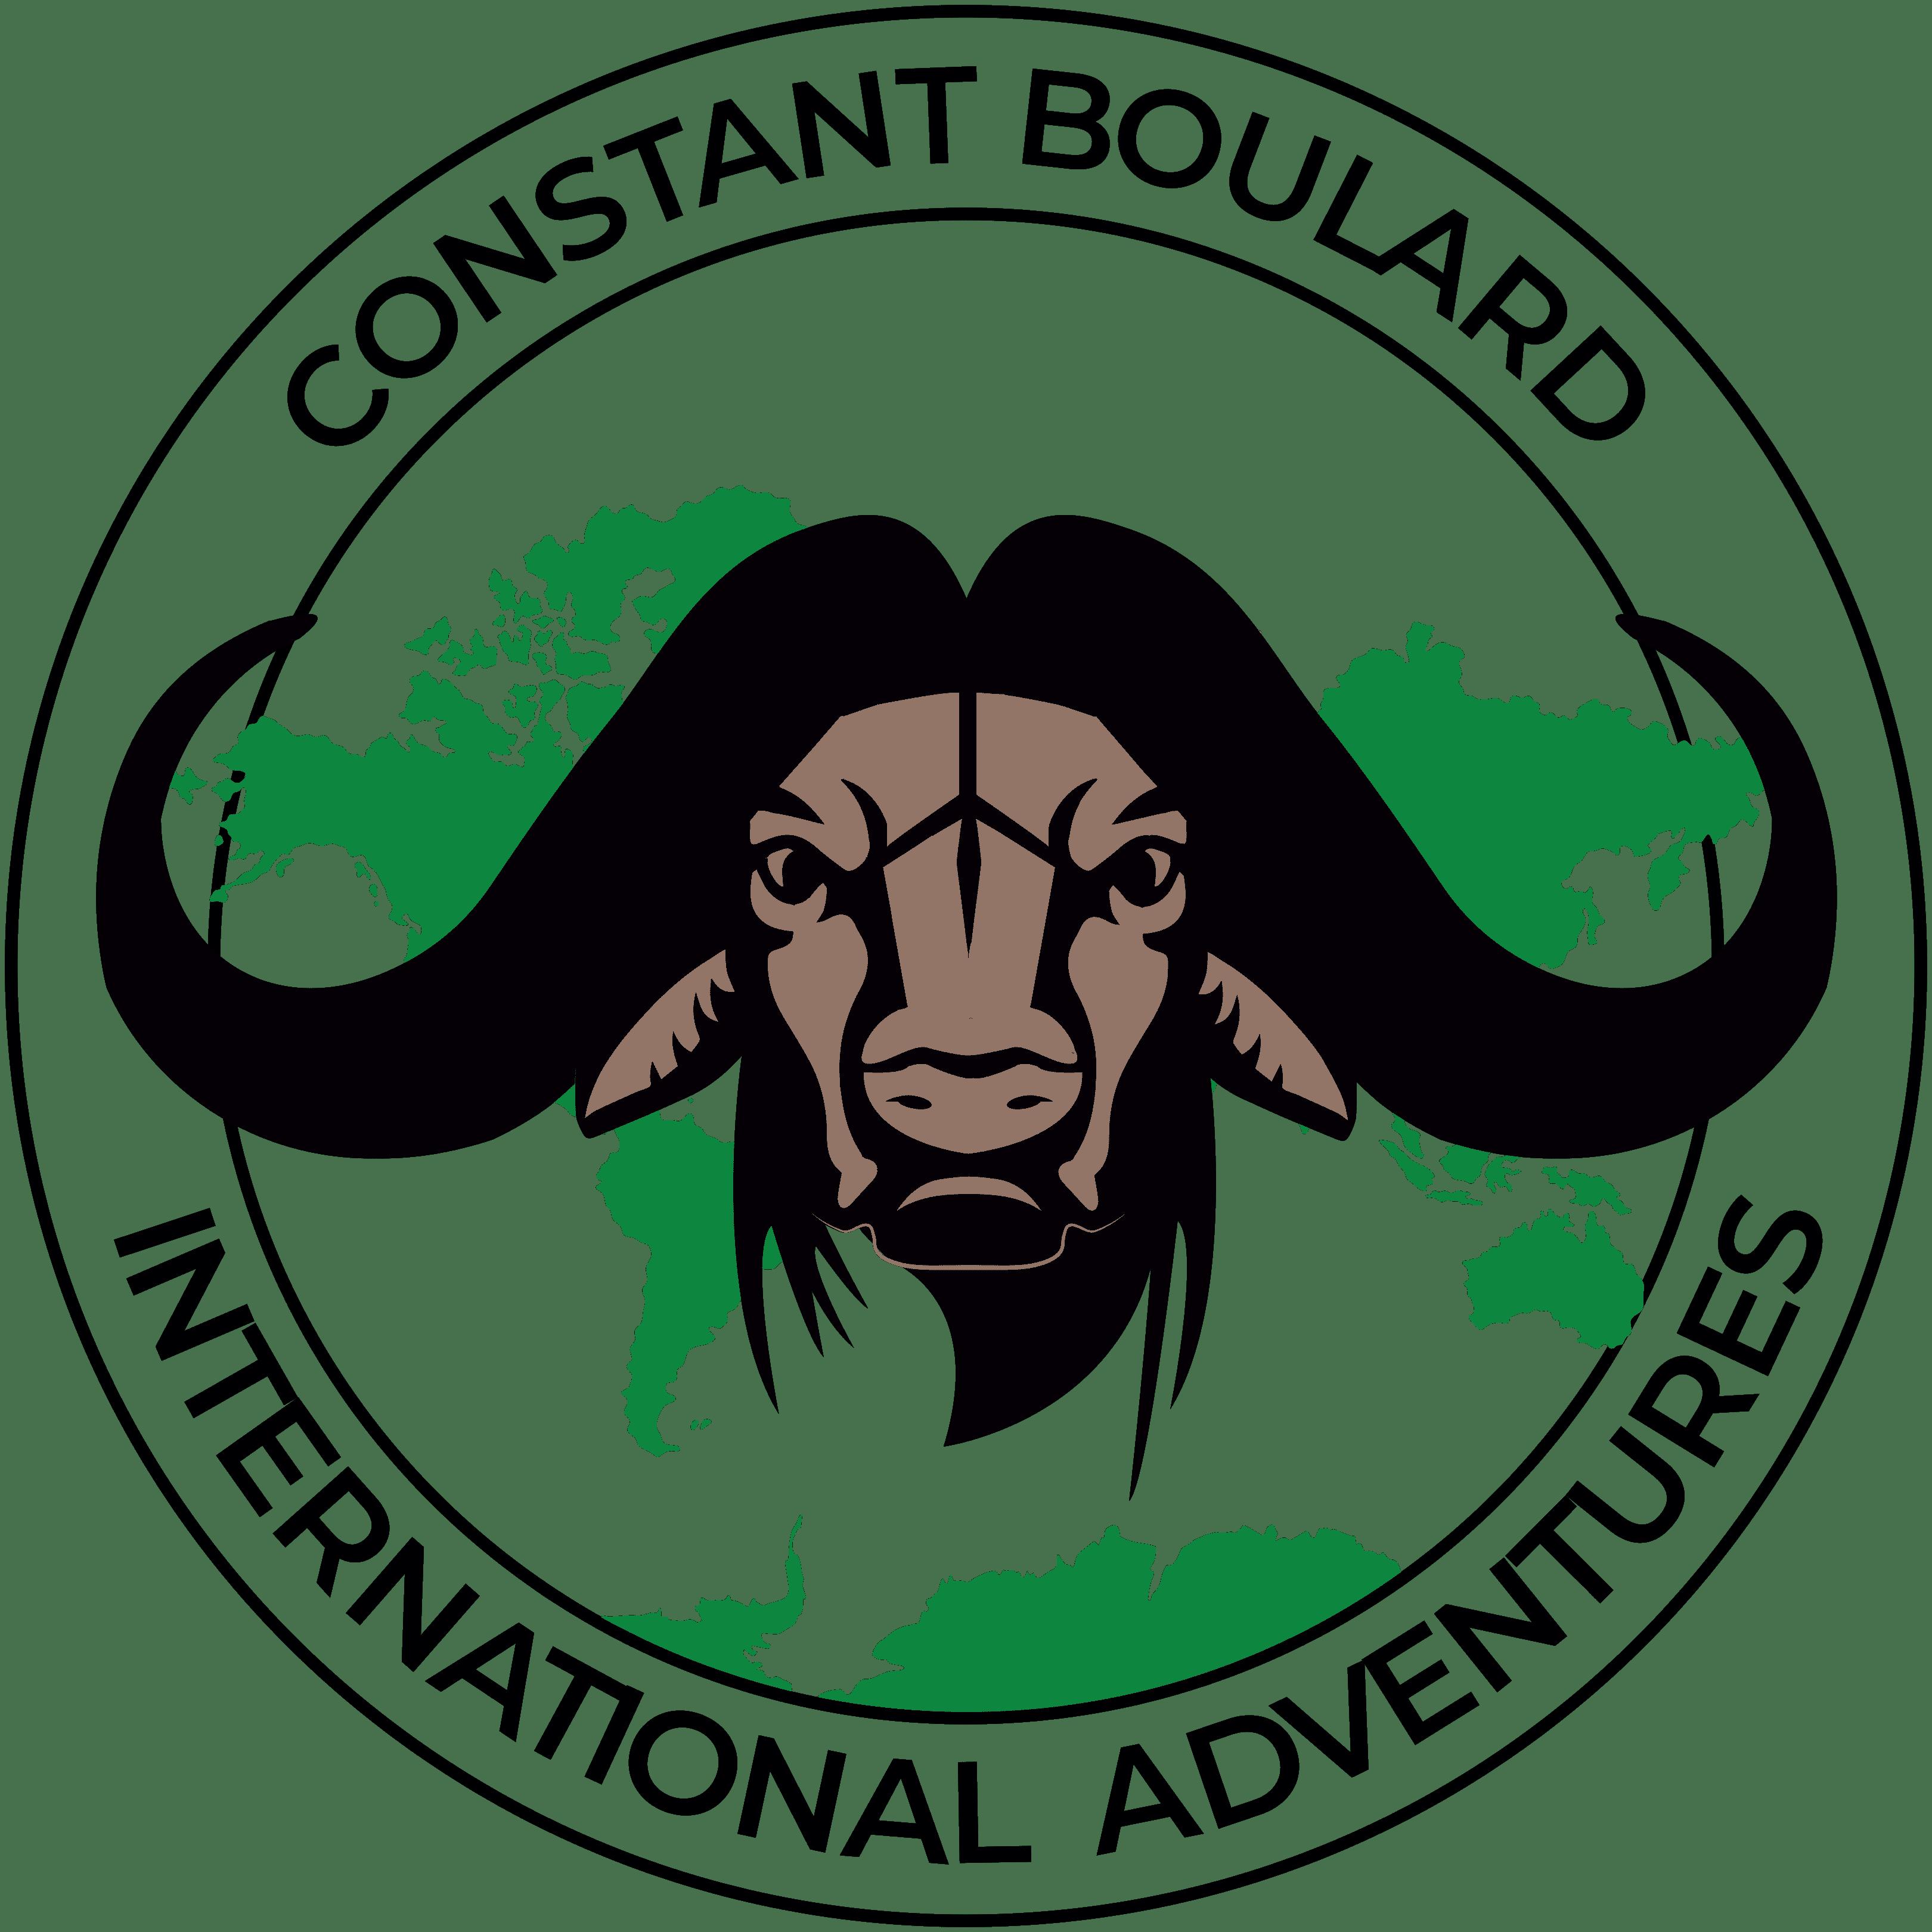 constantboulardinternationaladventures